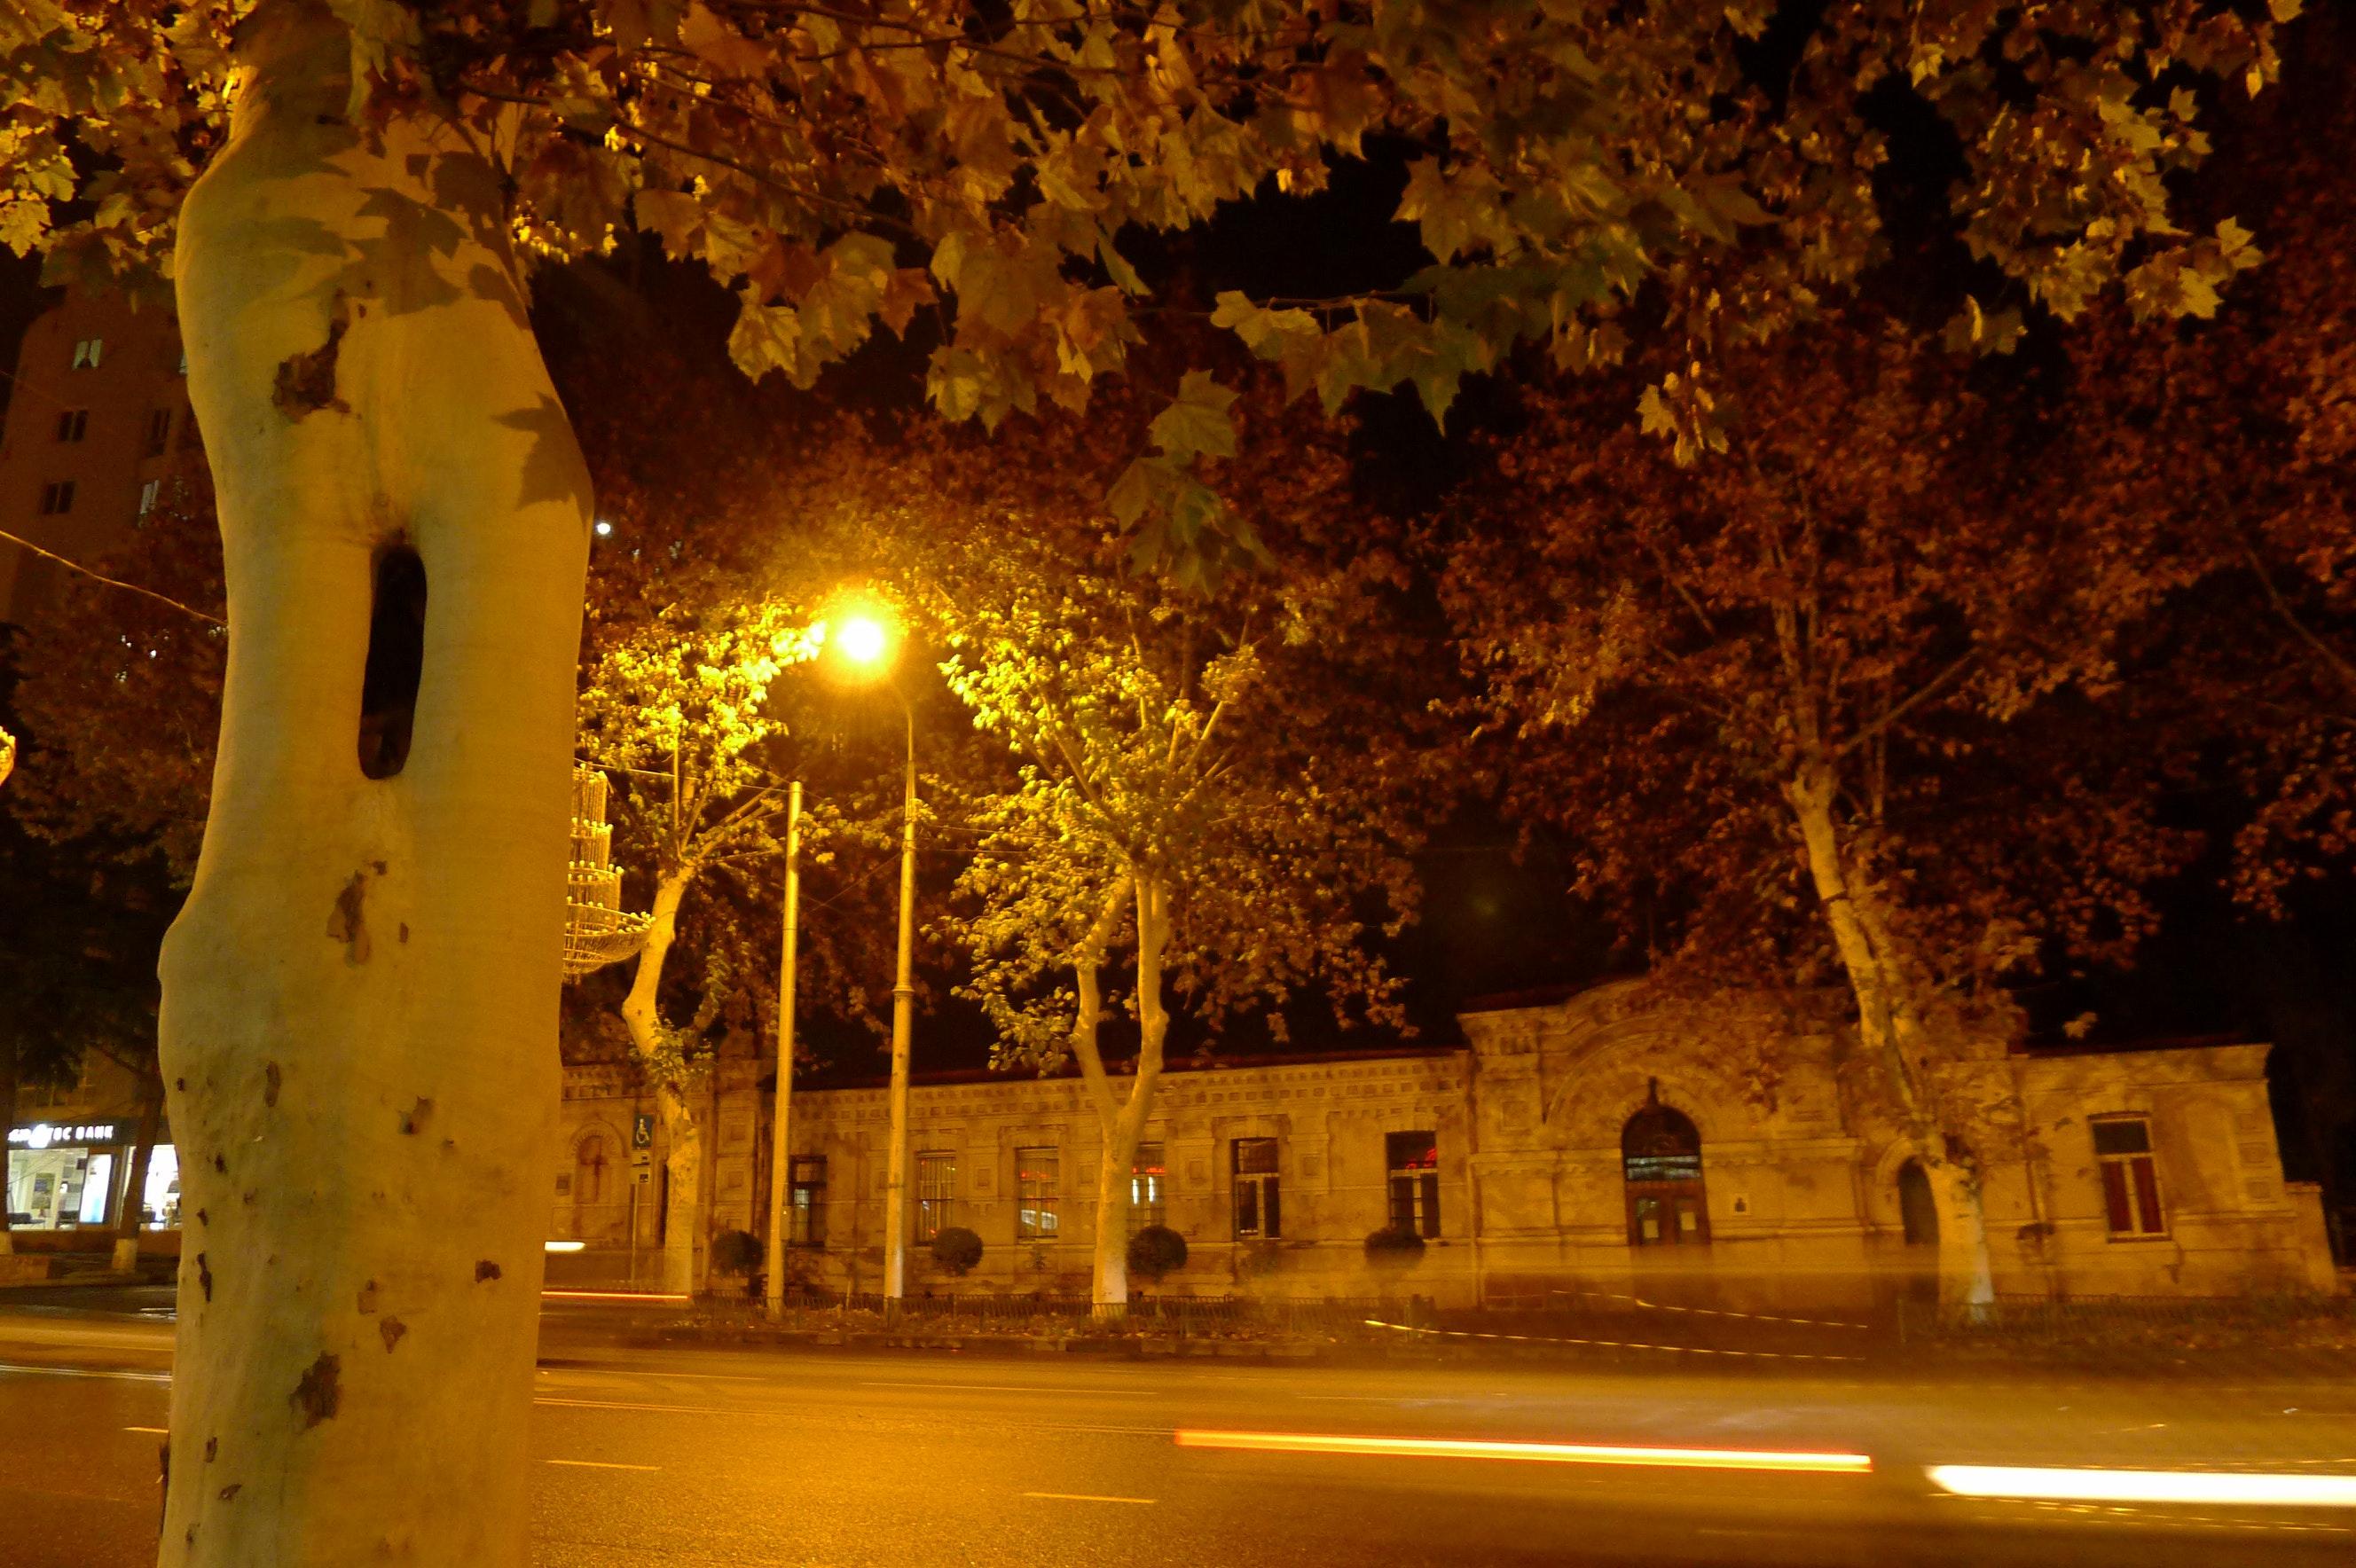 Free stock photo of #Tree, city lights, empty street